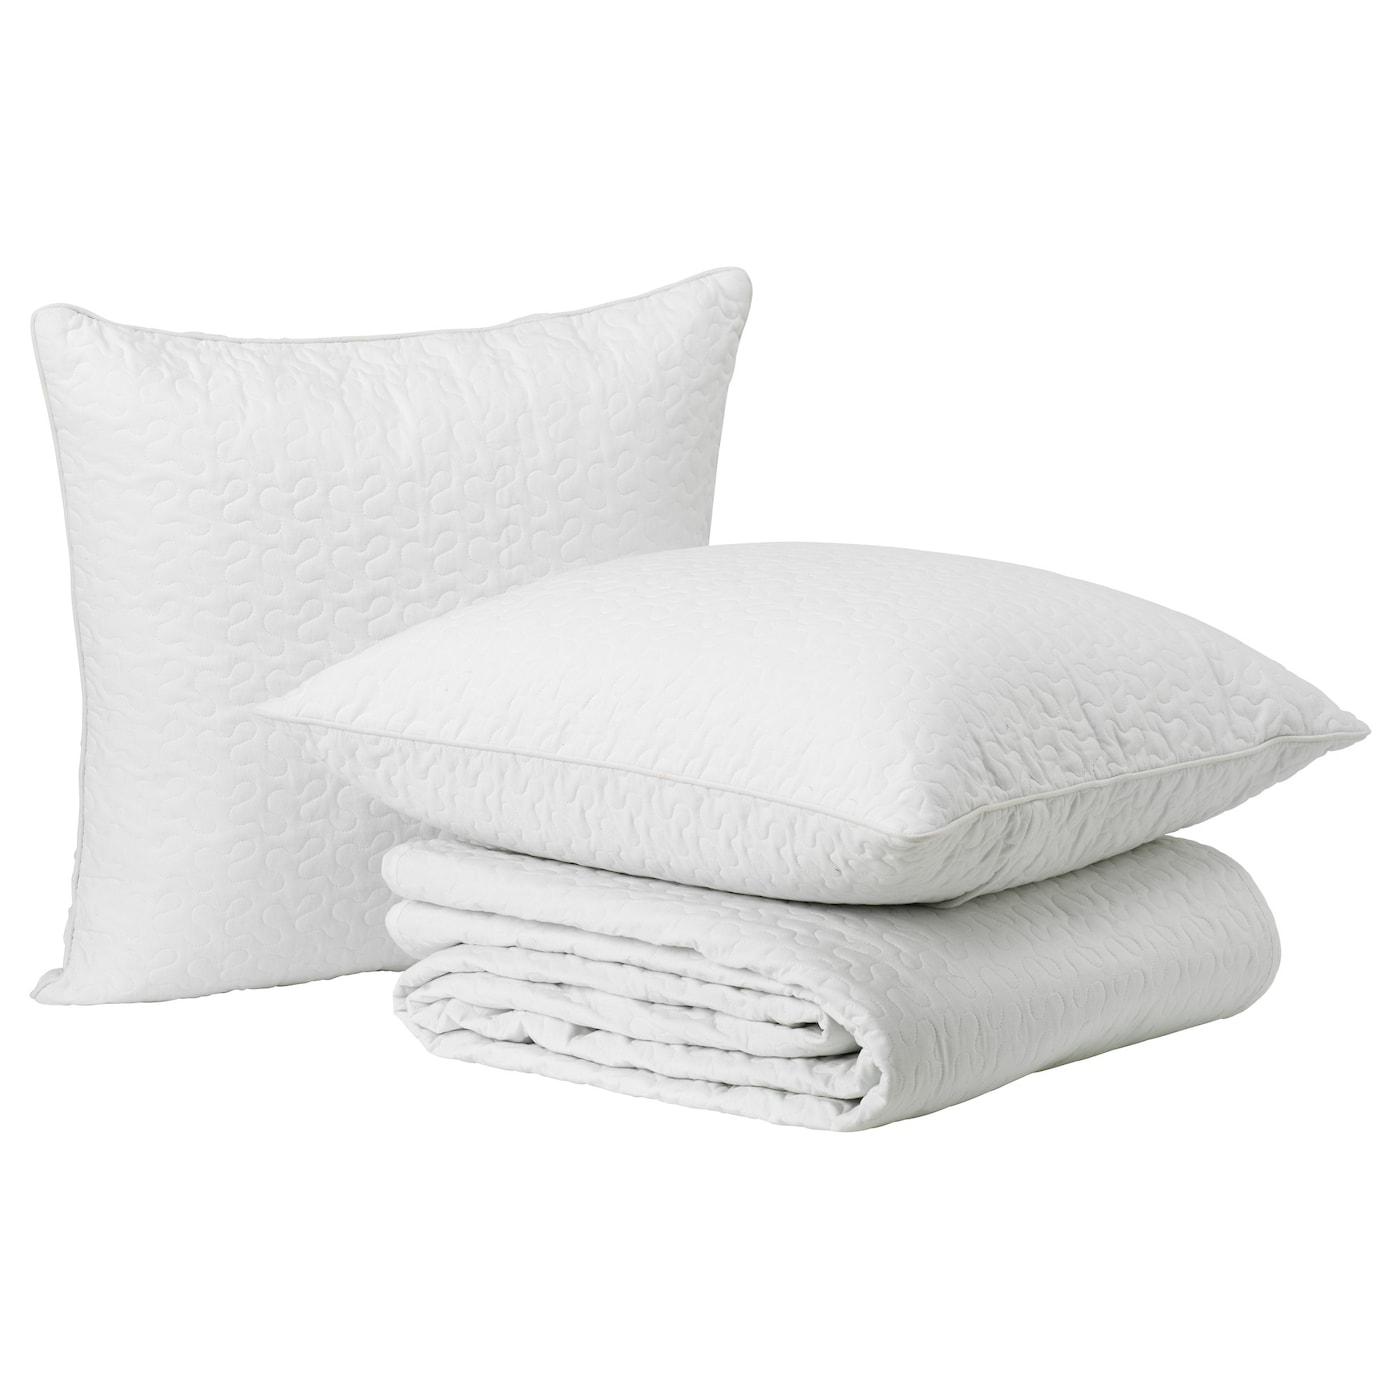 Alina bedspread and 2 cushion covers white 260x280 65x65 cm ikea - Copriletto alina ikea ...